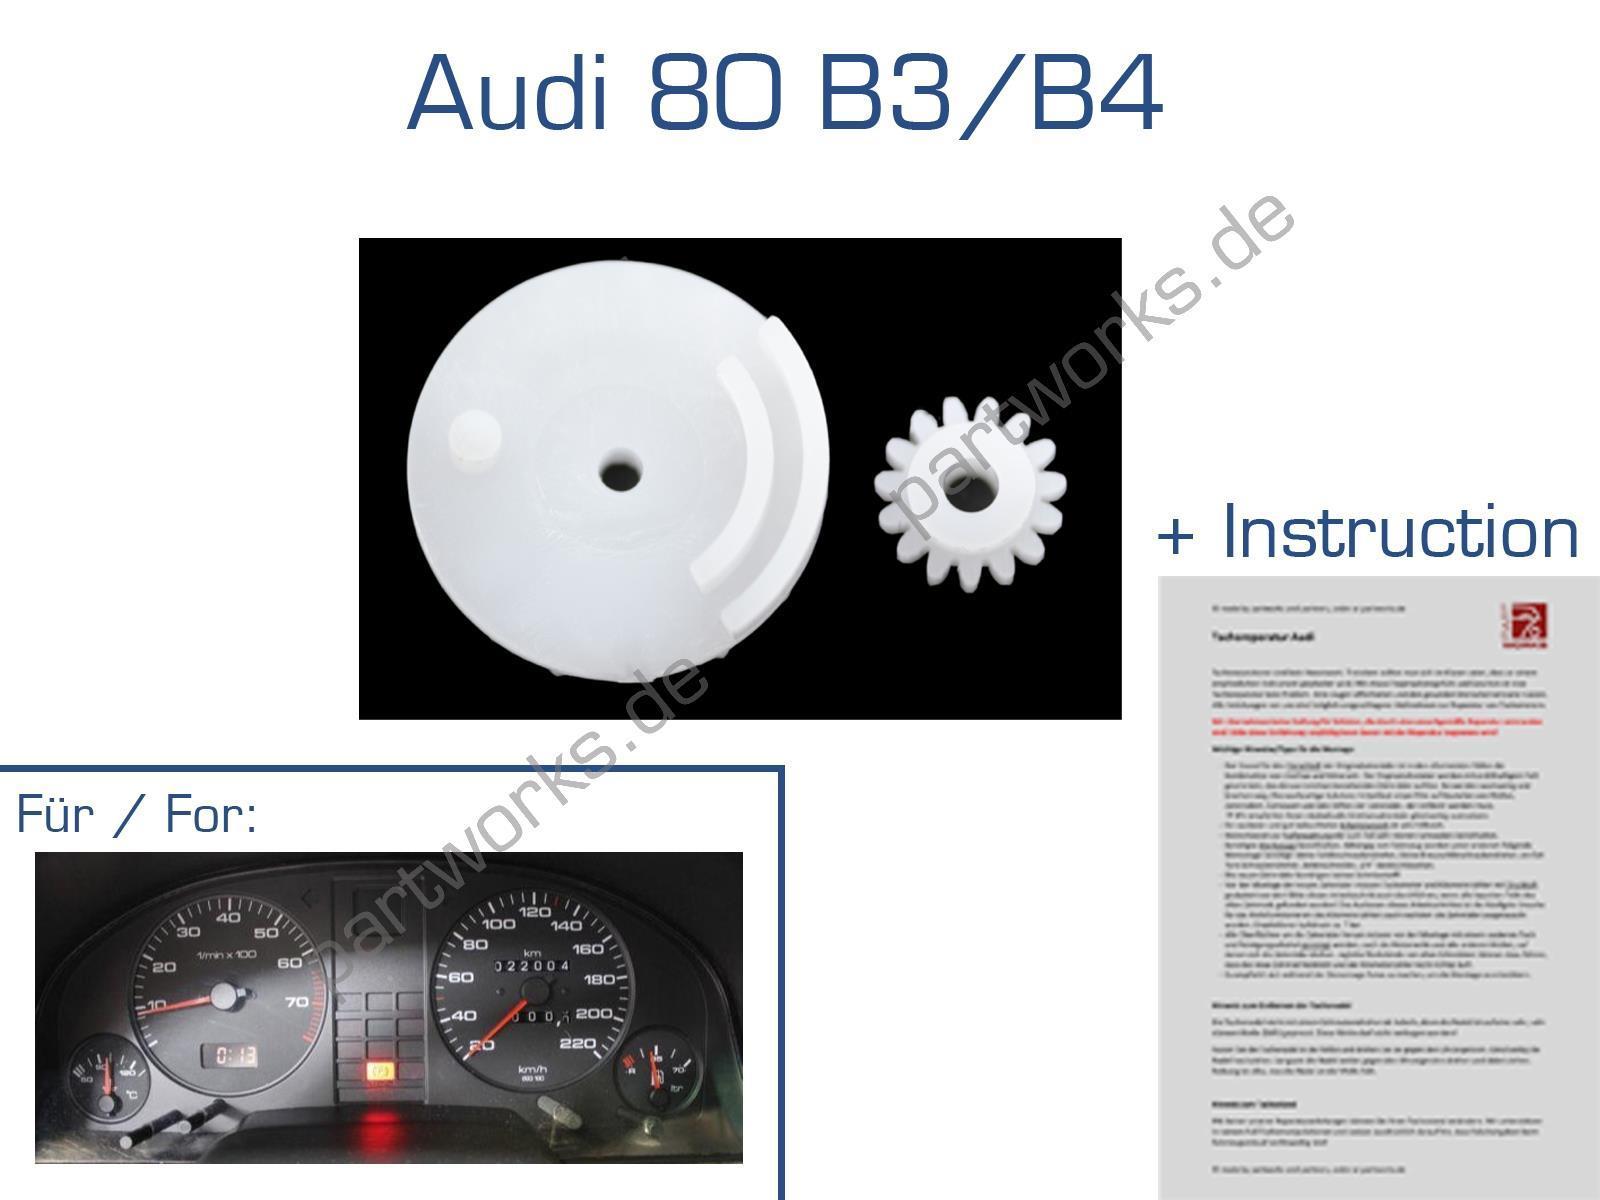 E15 + 15-K Zahnräder für Audi 80 B3/B4 Tacho Kilometerzähler Reparatur